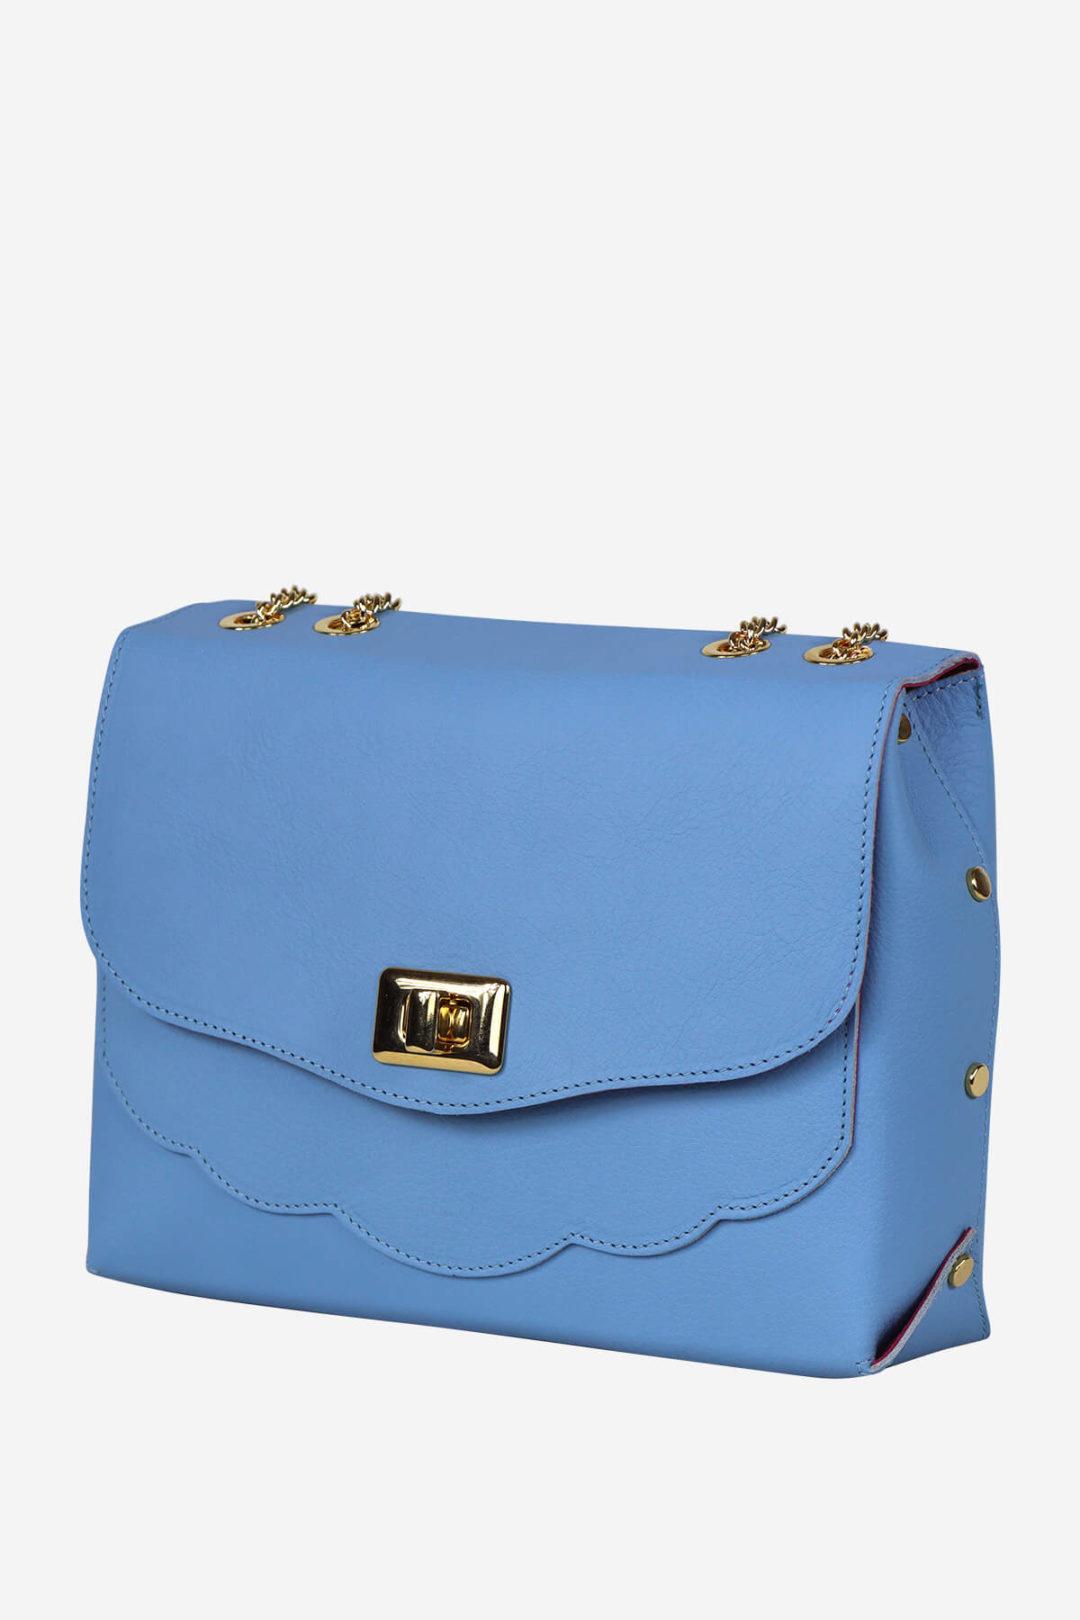 Italian Tradition in Fashion Loving Handbag handmade in italy vegetable tanned leather poetry bag lovunlimited venezia terrida